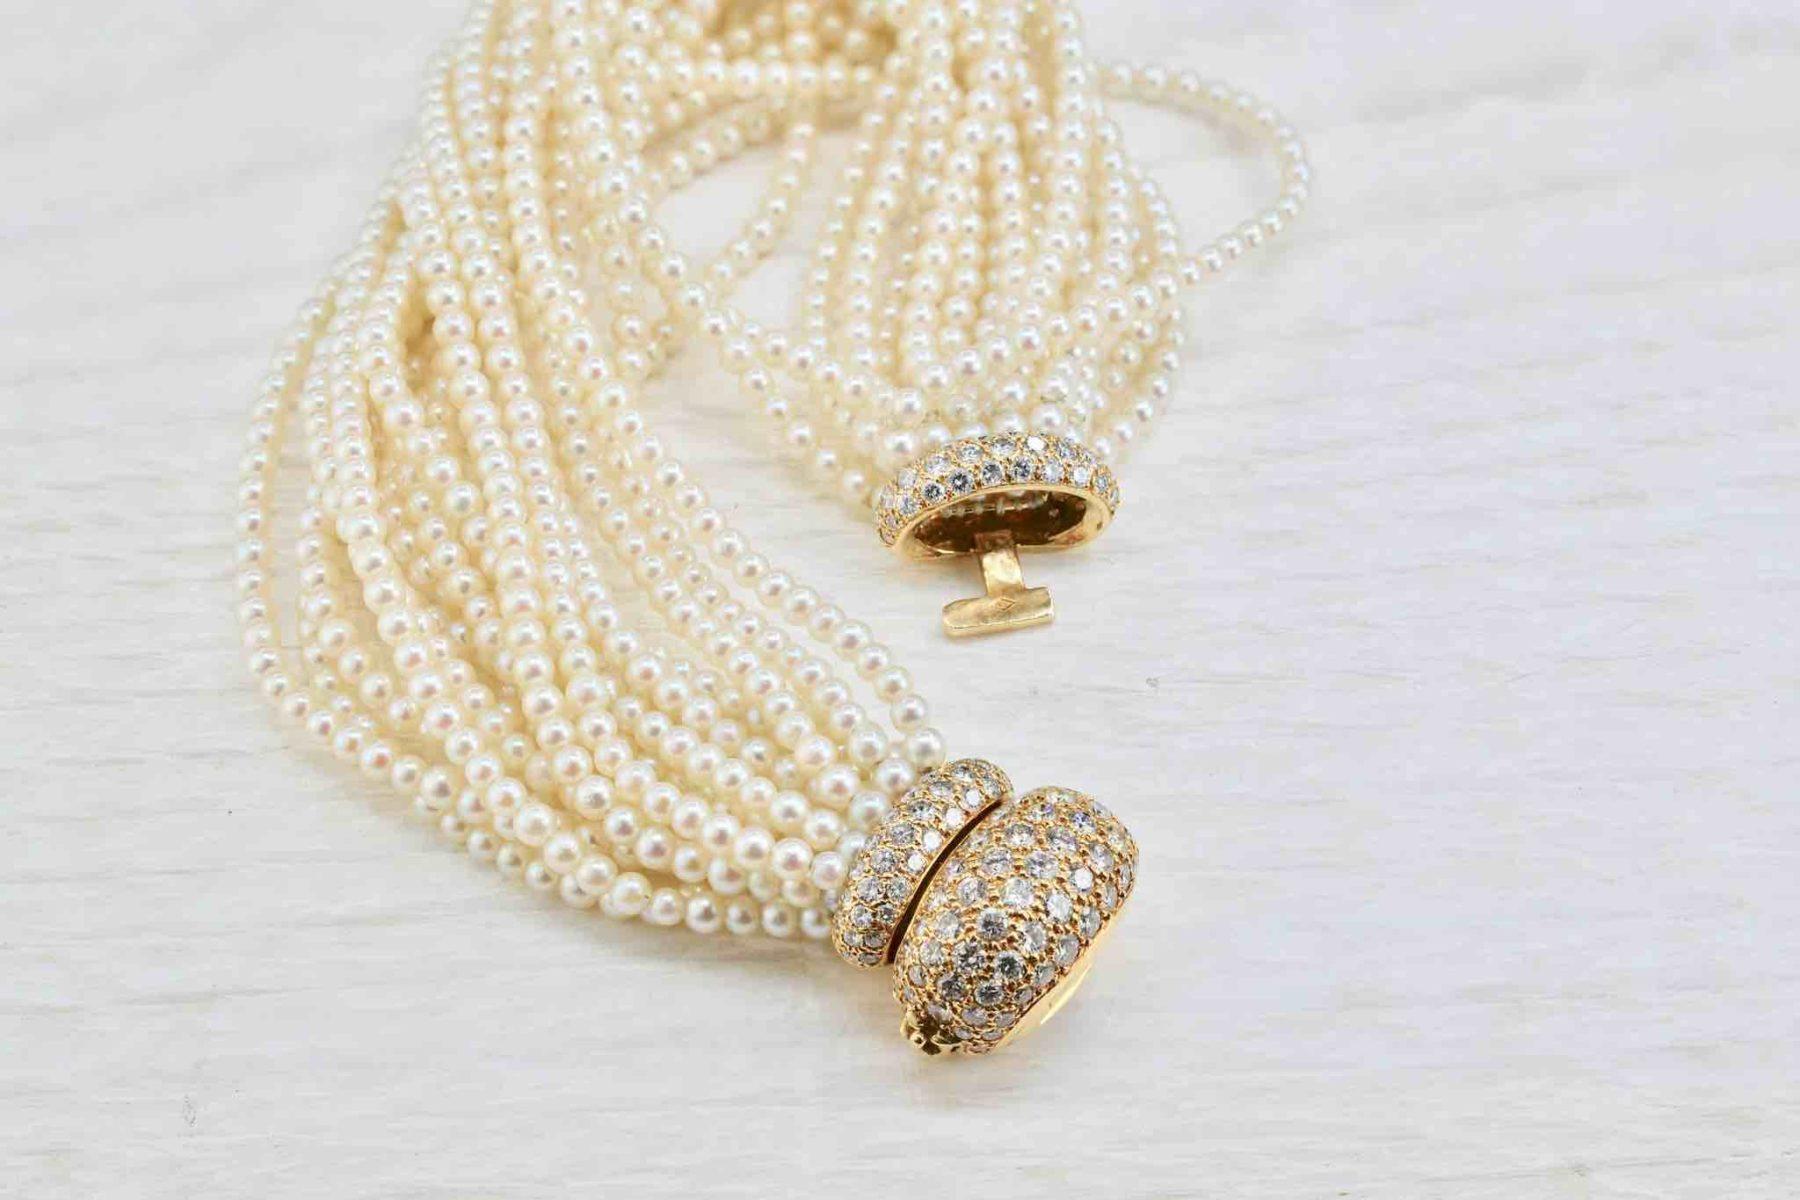 bracelet OJ Perrin perles et diamants